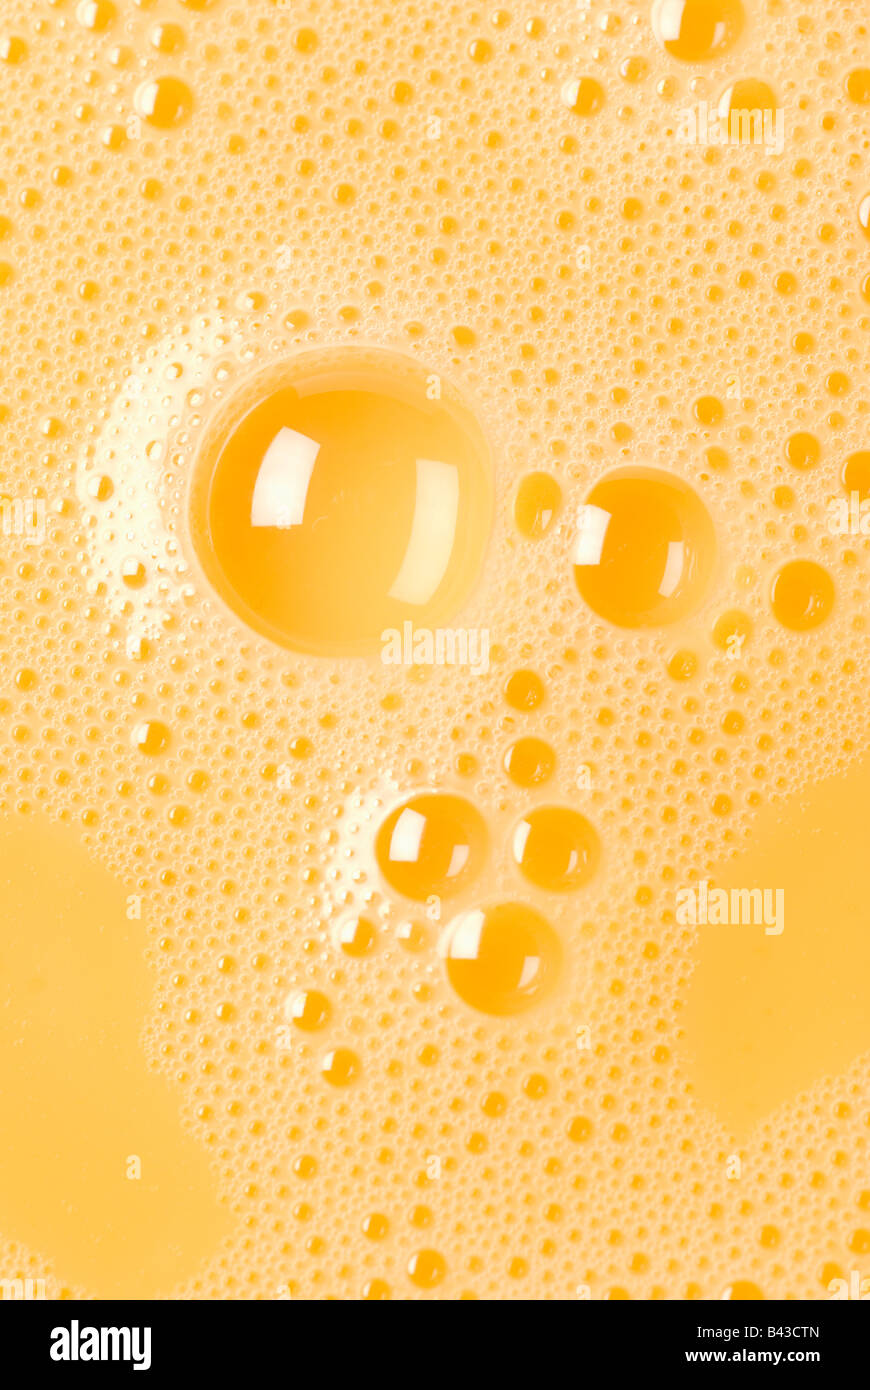 Close-up de jaunes d'oeufs battus avec bulles Banque D'Images